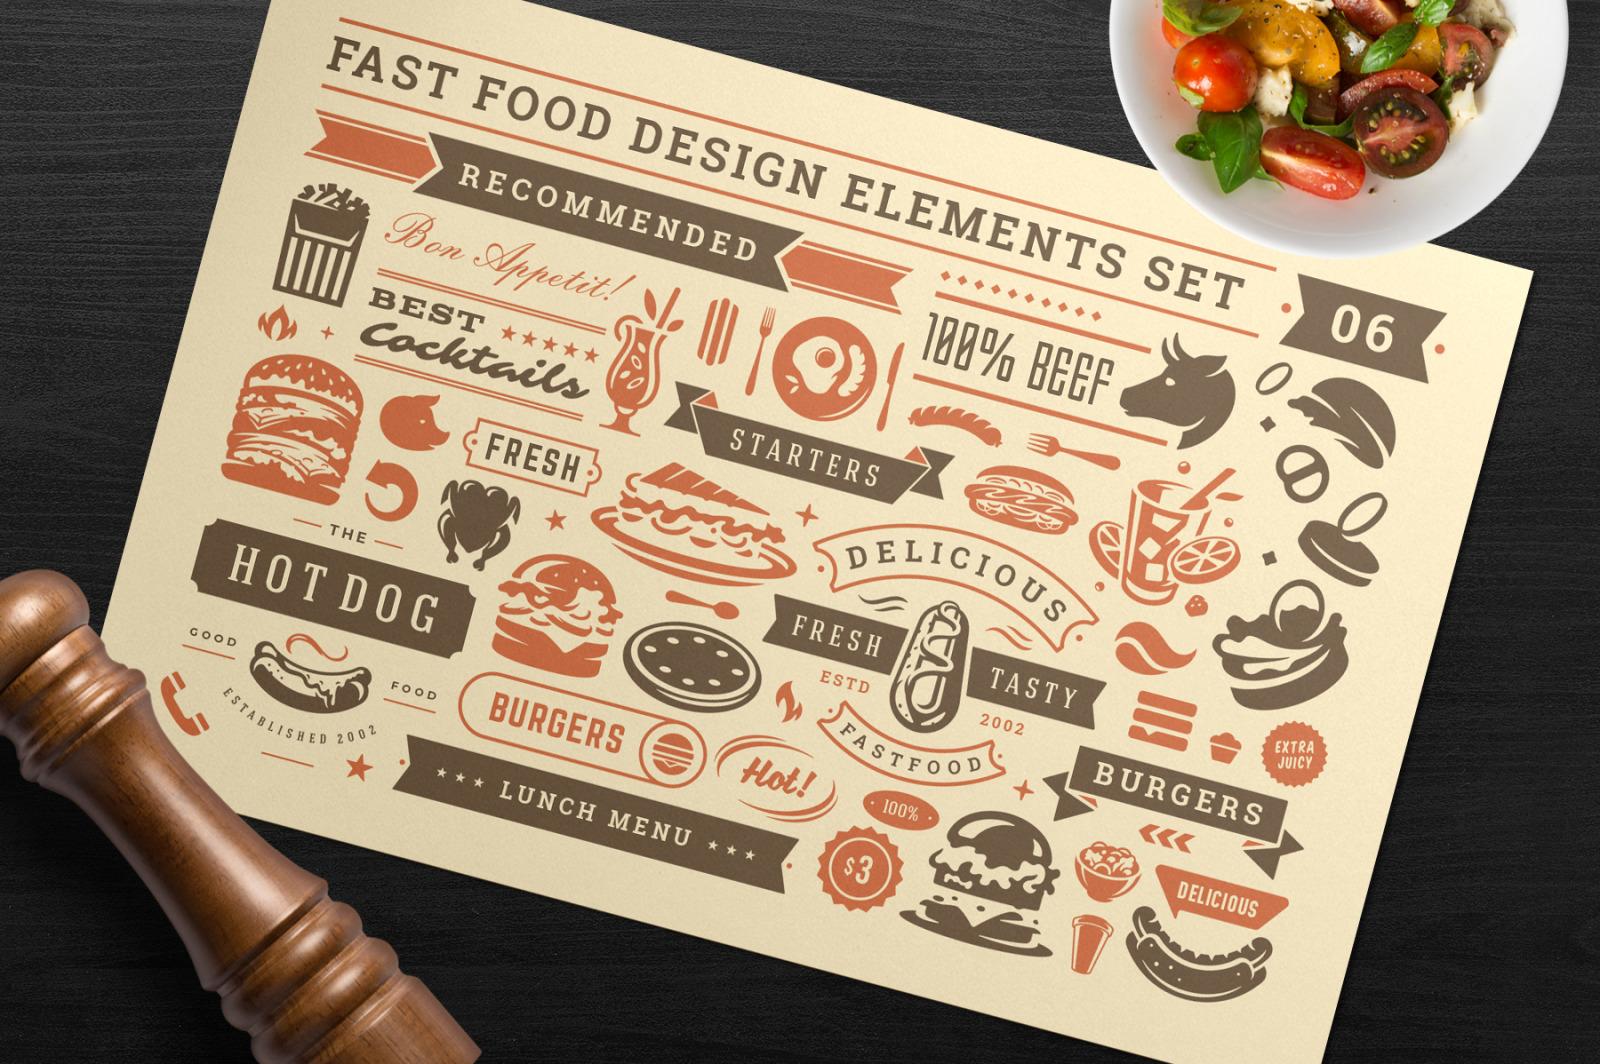 Fast Food Design Elements